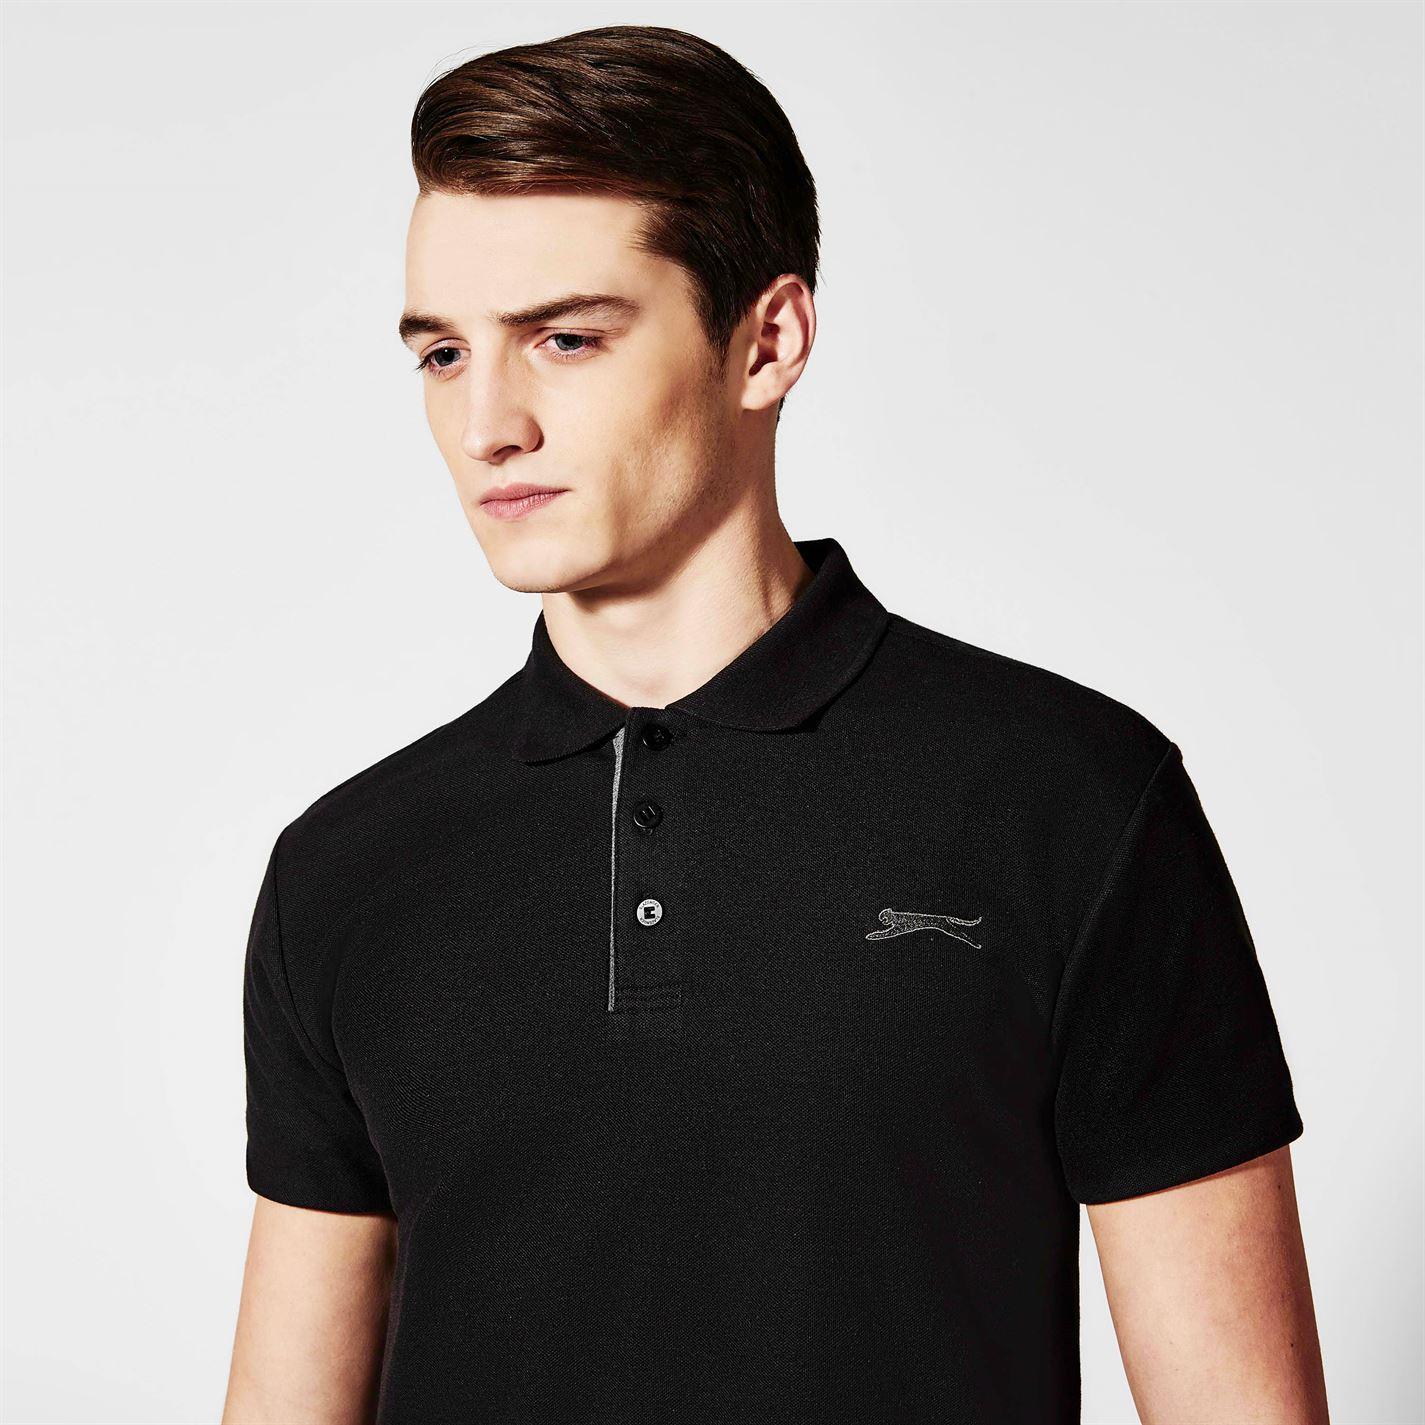 7985ea8956 Slazenger Plain T Shirt Mens